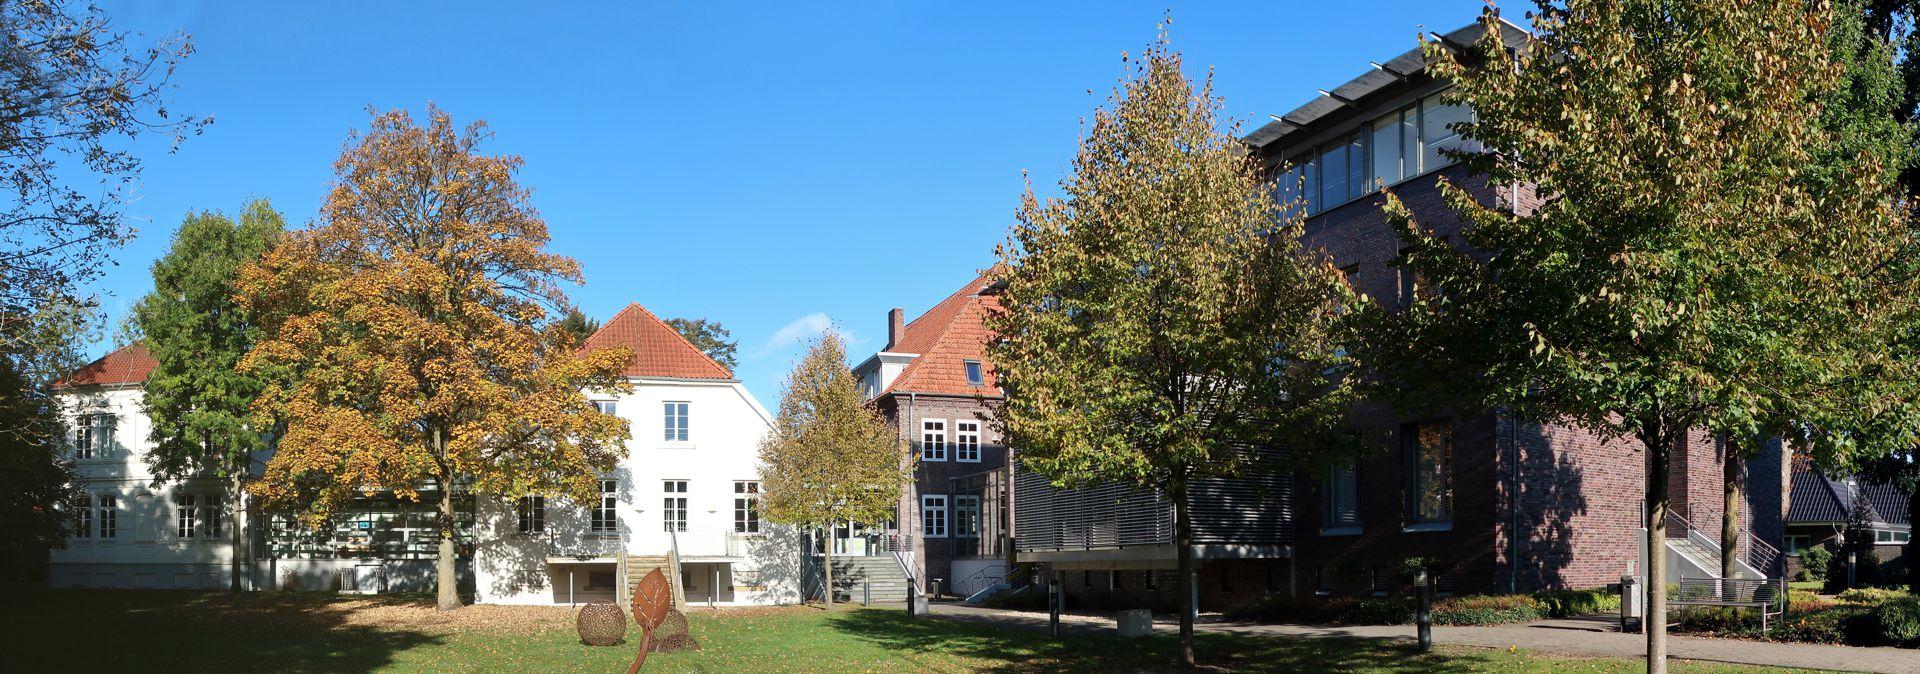 Stadt Friesoythe Herbst